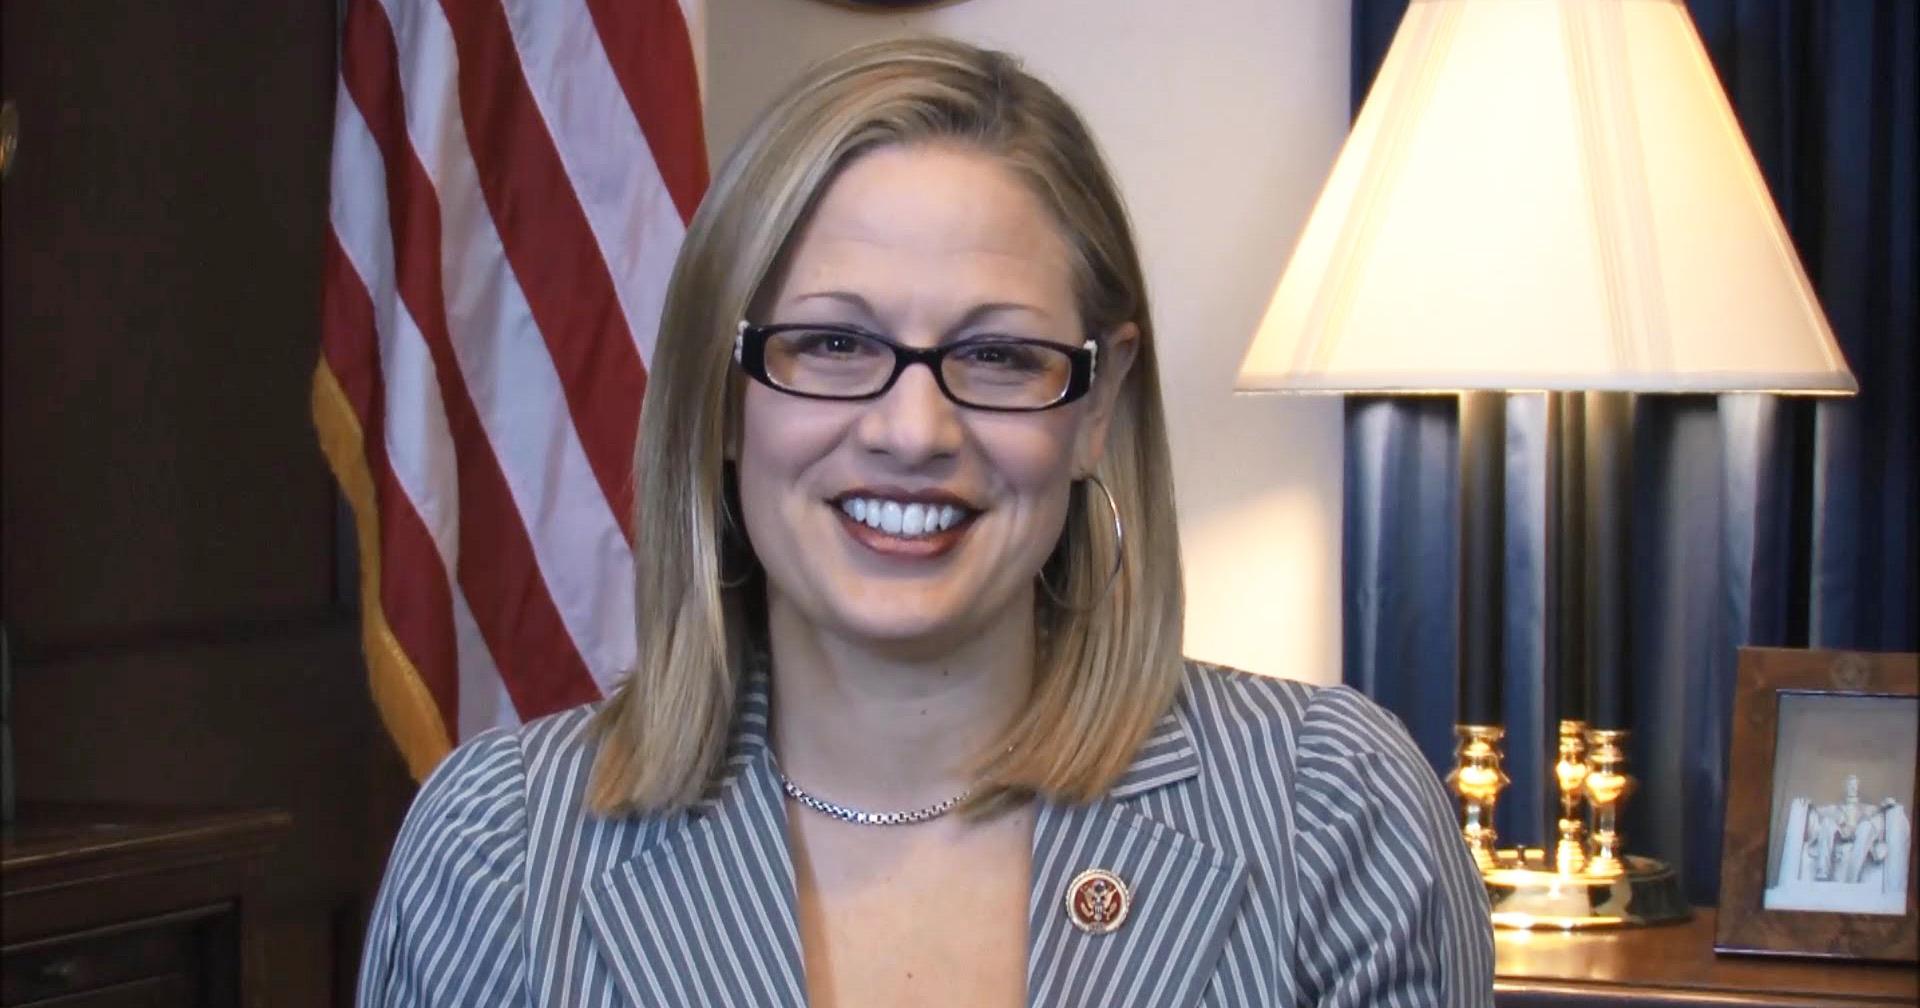 Krysten Sinema smiles at camera in her office.